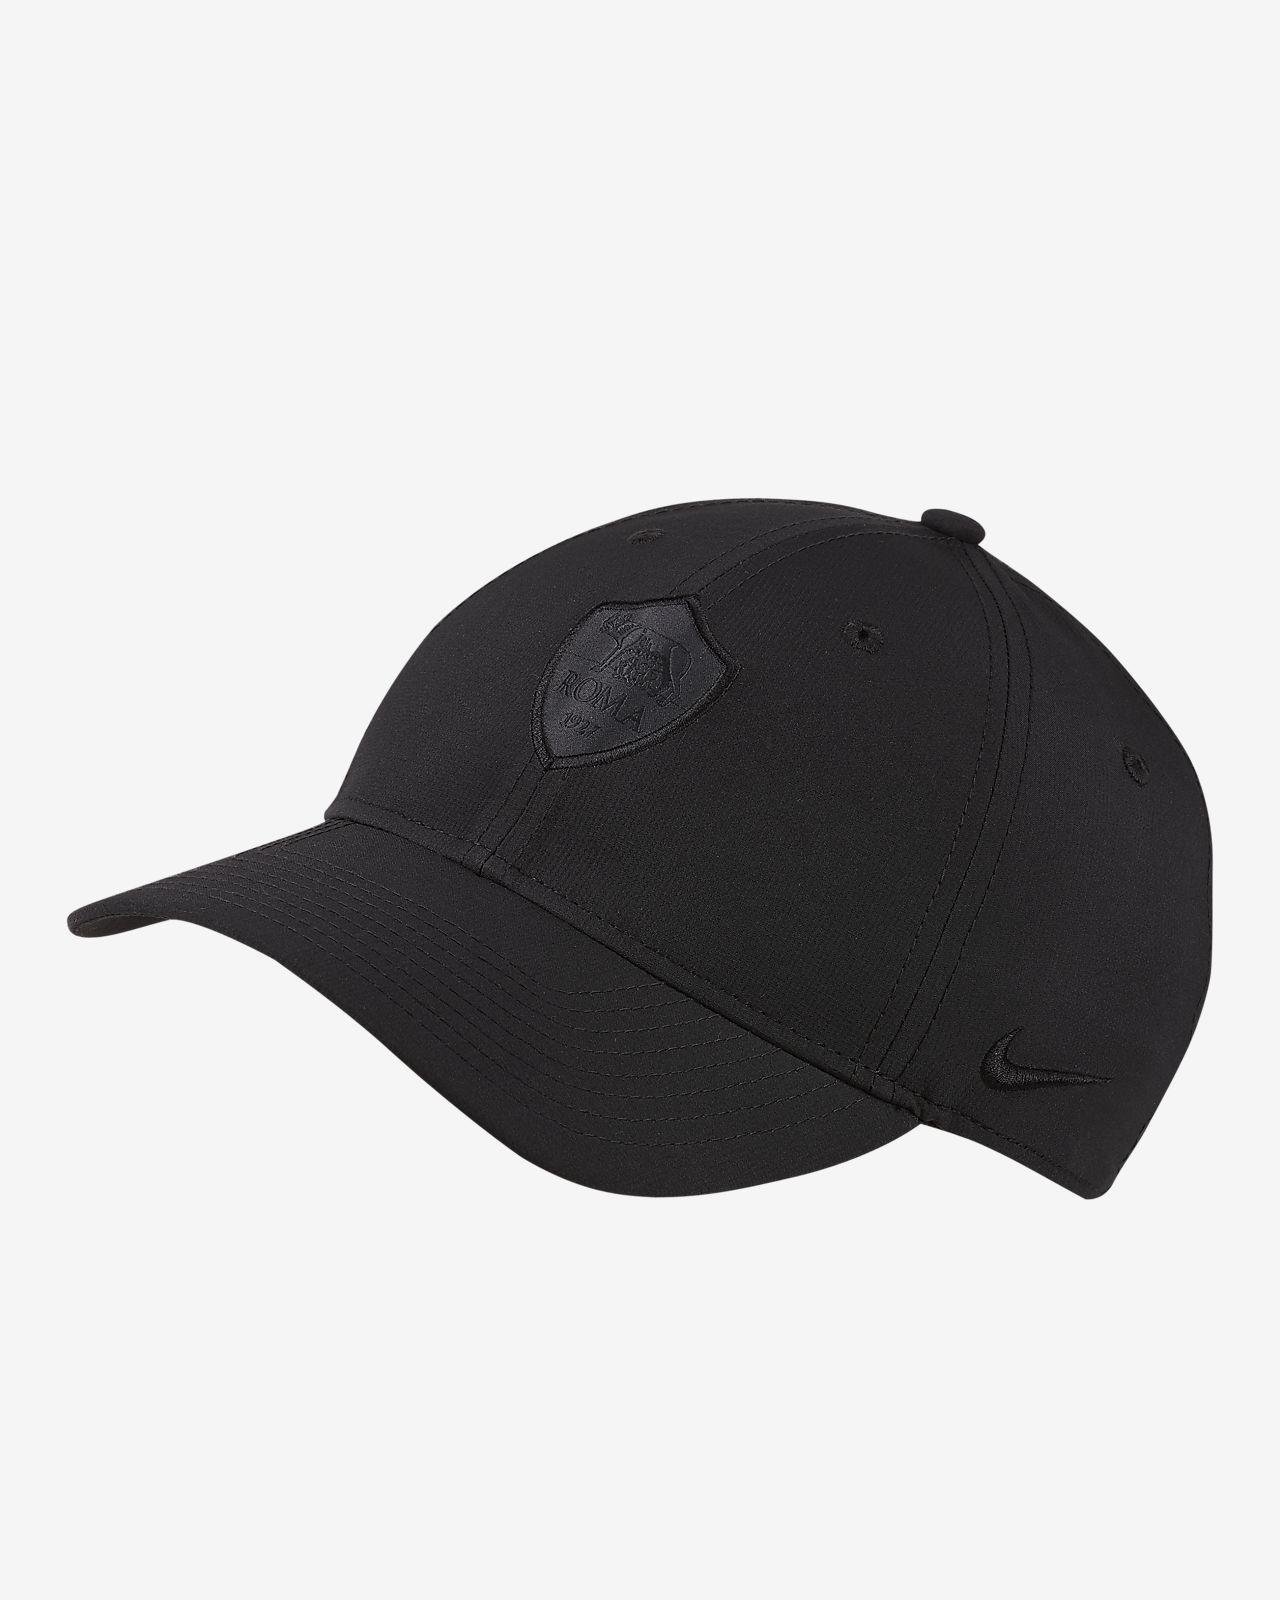 A.S. Rom Legacy91 verstellbare Cap